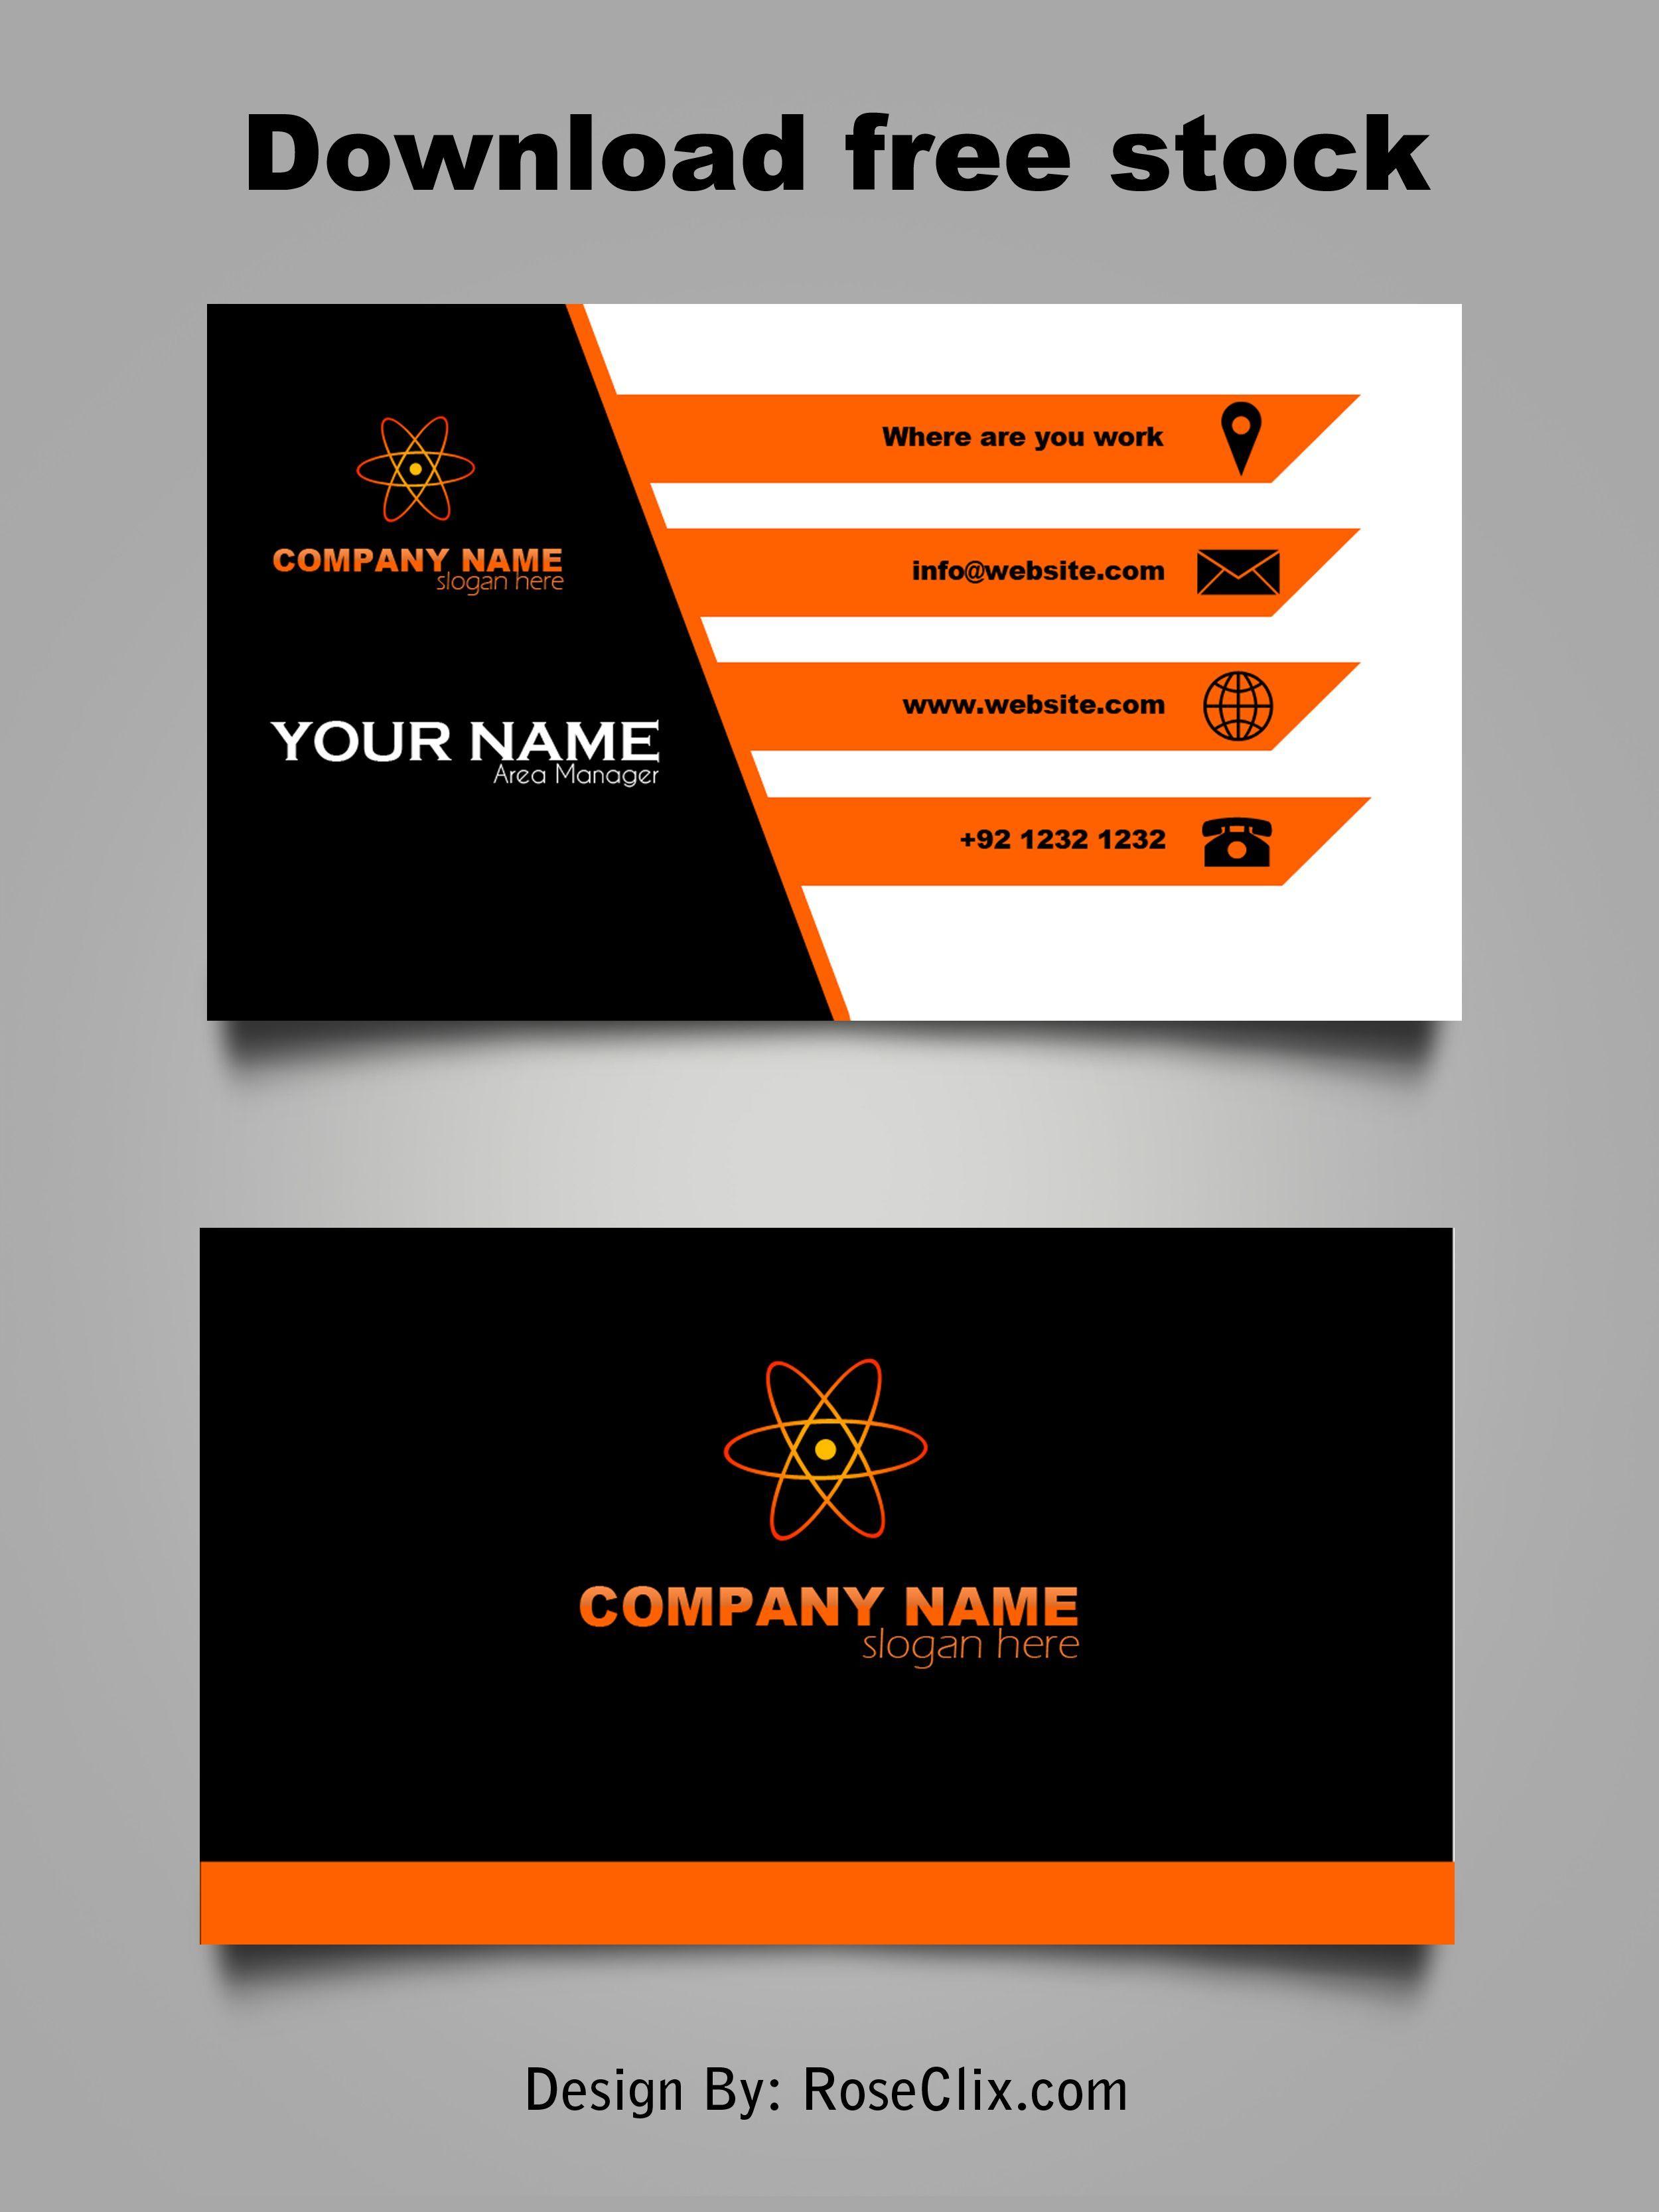 Business Card Template Free Downloads Psd Fils Business In Templates For Visiting Free Business Card Templates Free Business Card Maker Business Card Maker Free download business card template